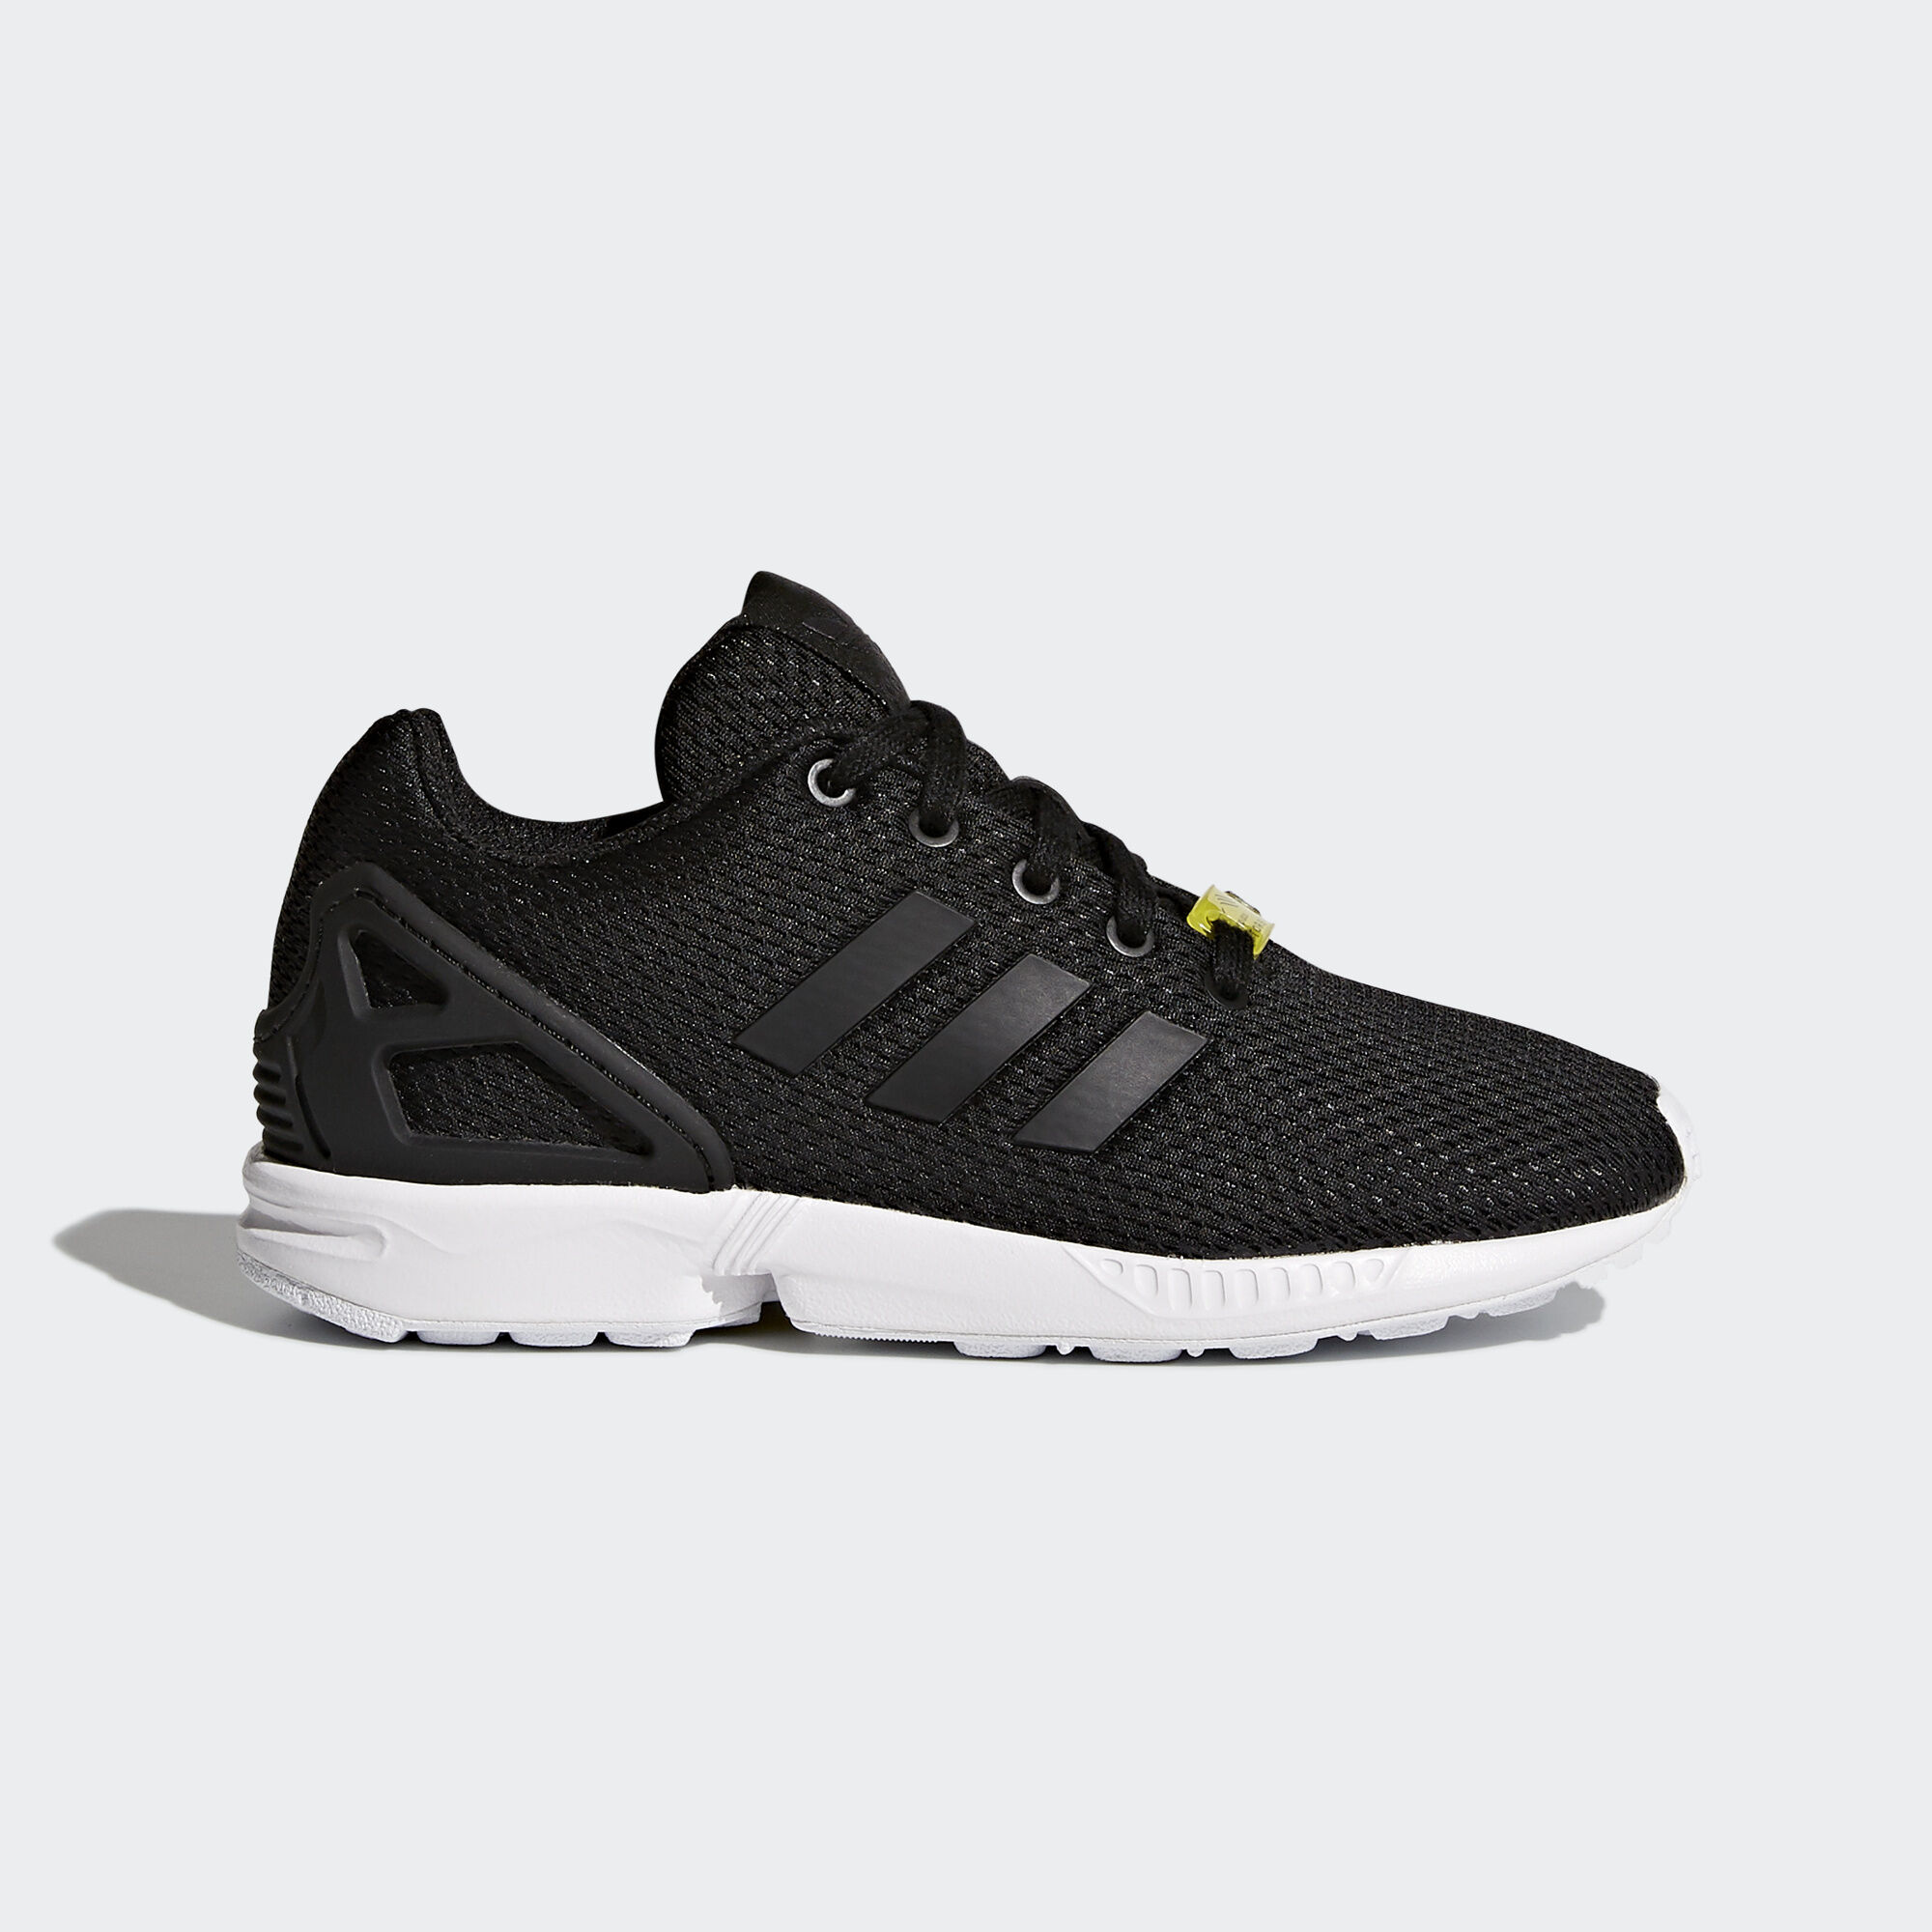 adidas originals zx flux all black trainers